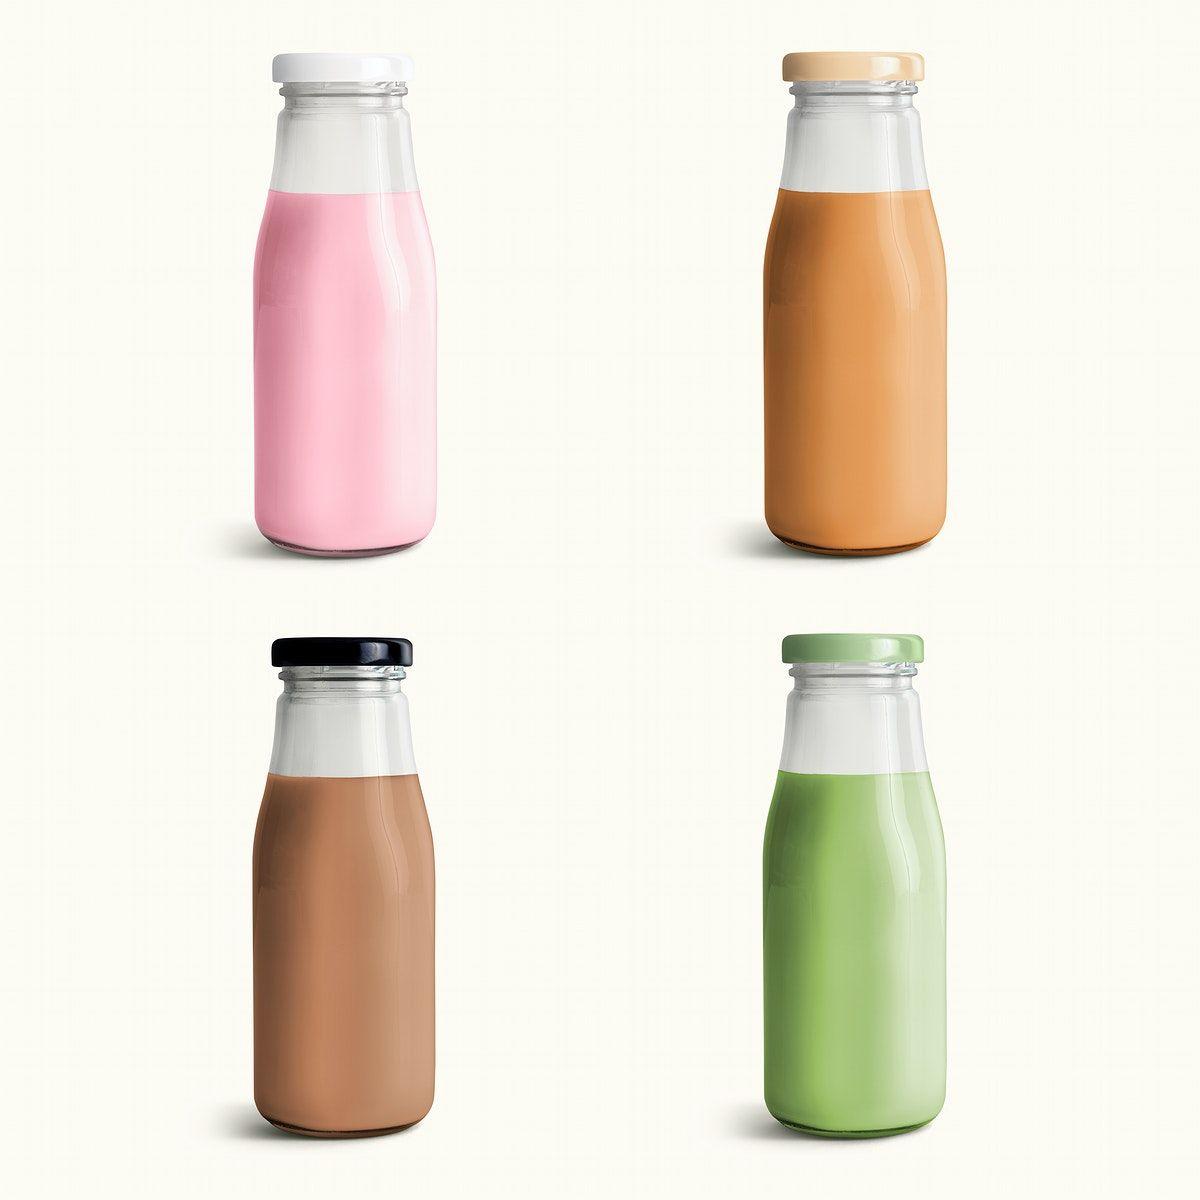 Download Download Premium Psd Of Milk Tea In Glass Bottles Mockup Set 2384751 Milk Packaging Milk Tea Bottle Mockup